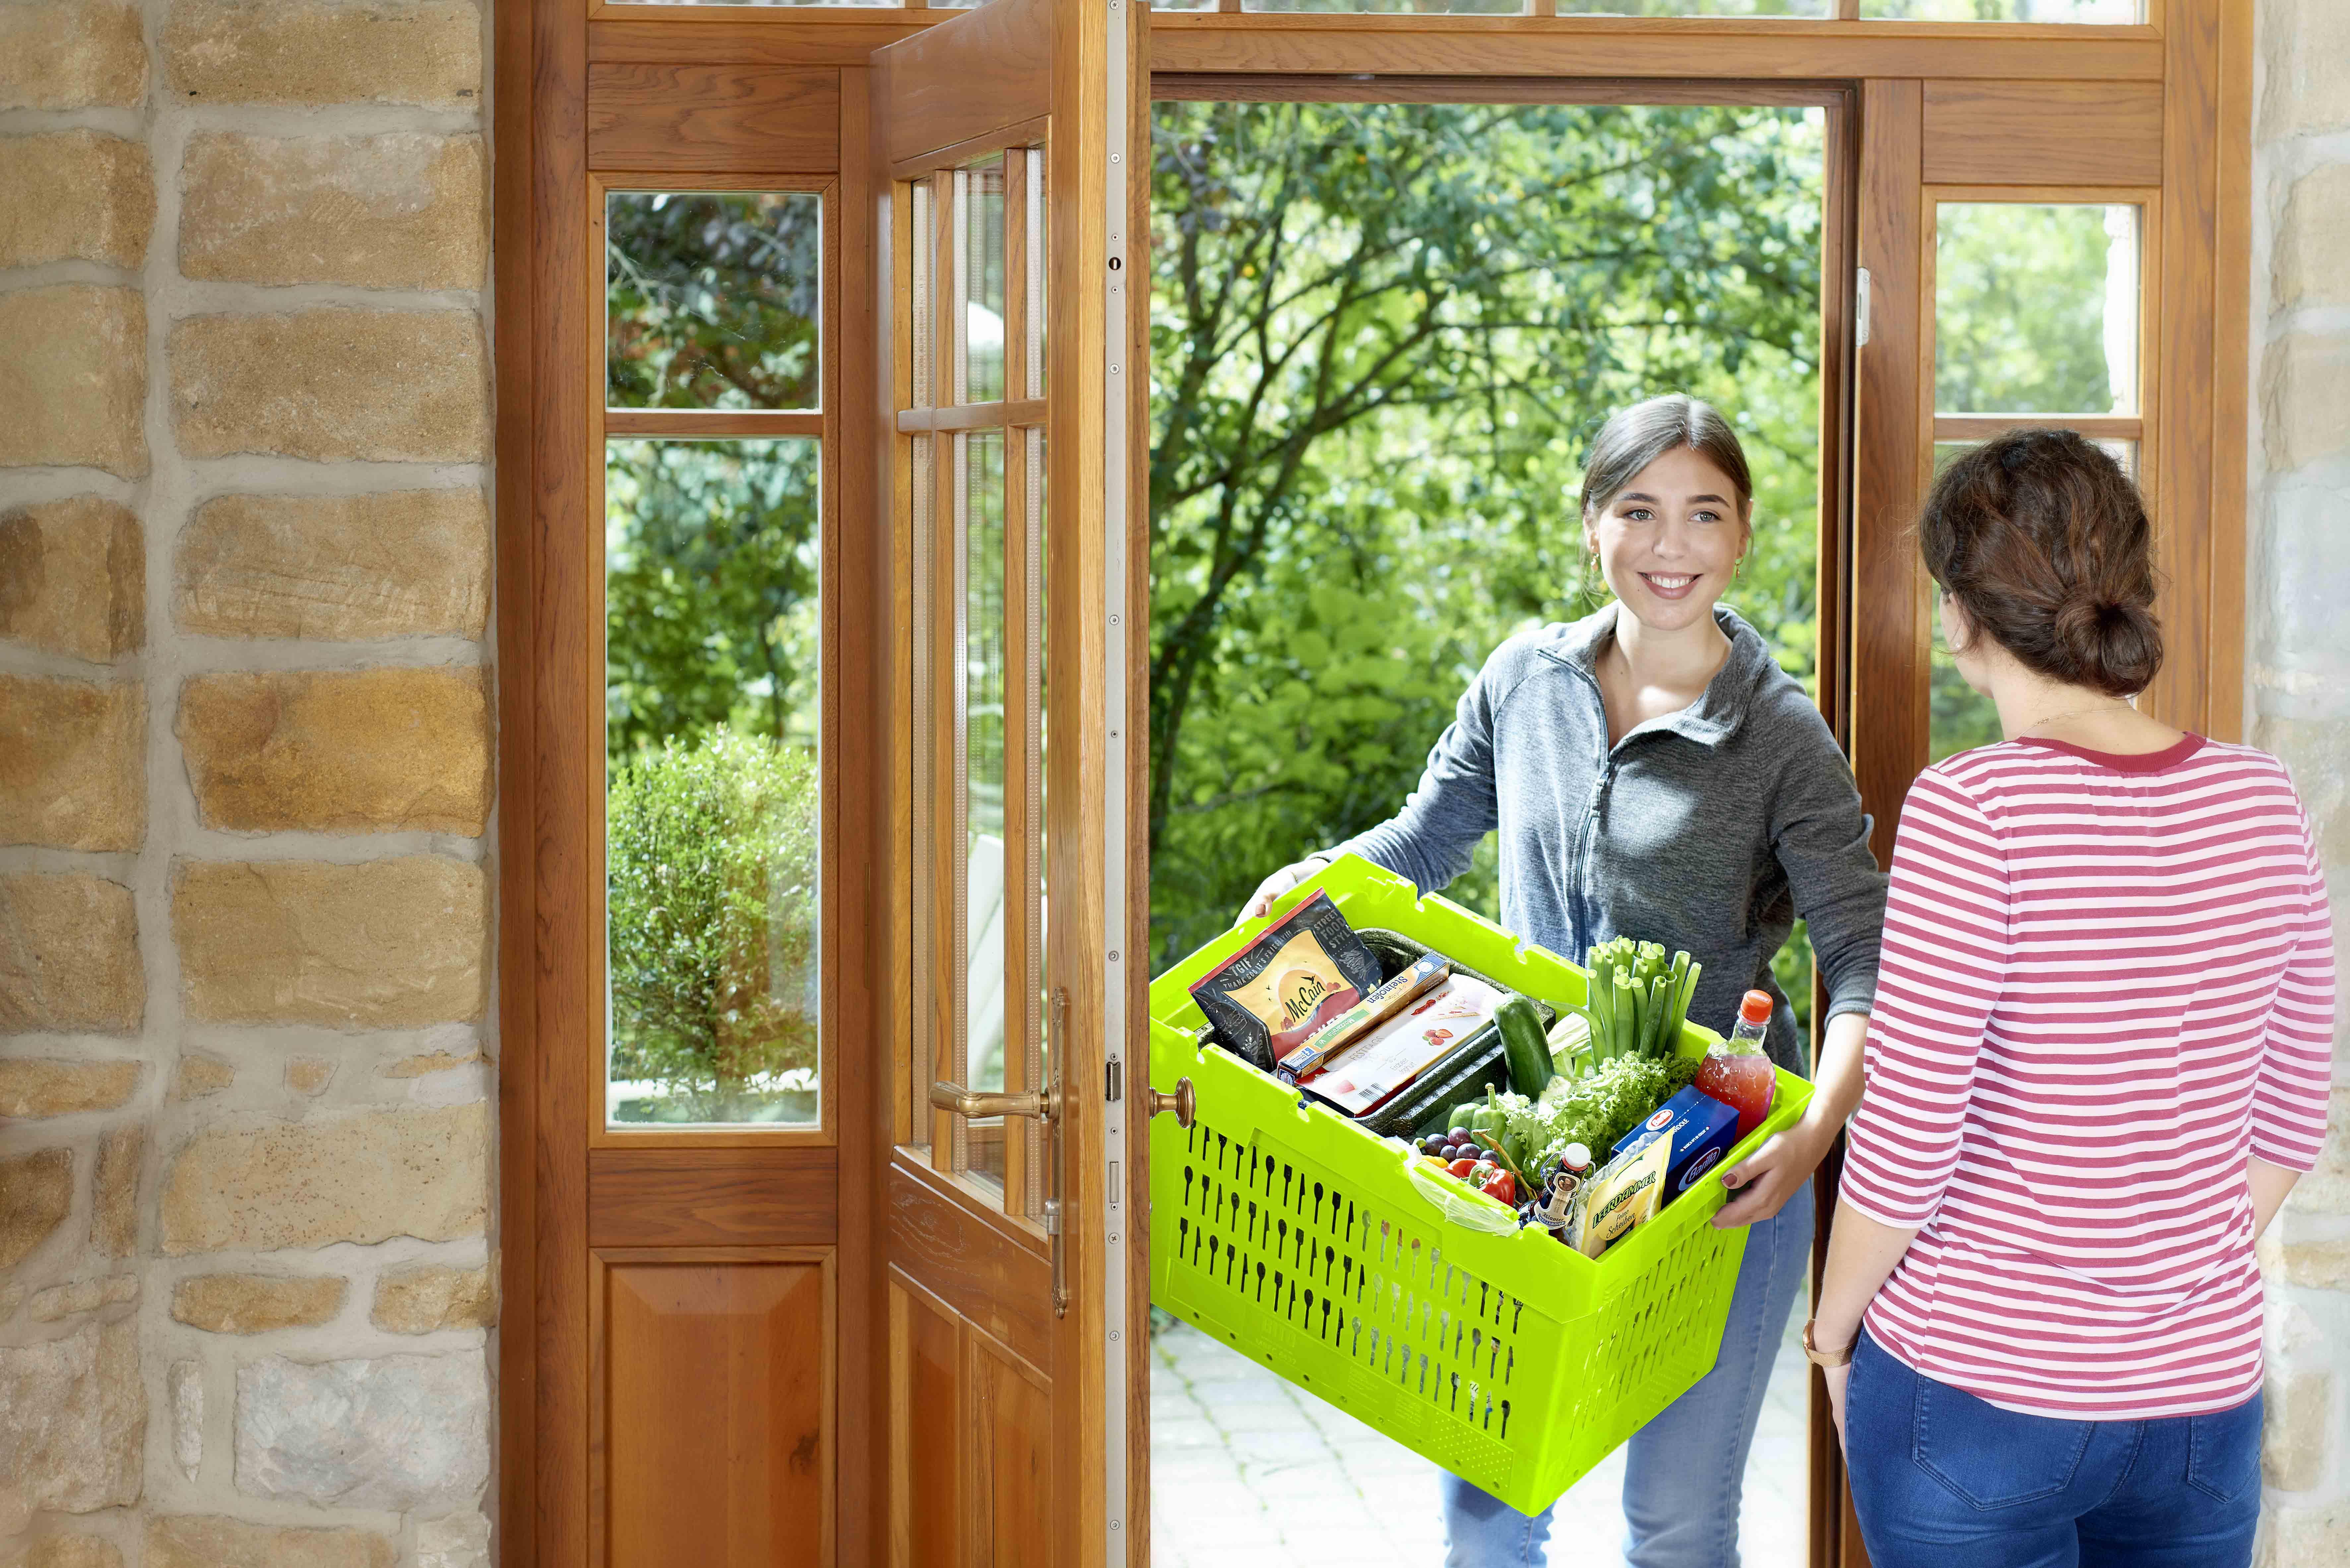 matleveranser till dörren